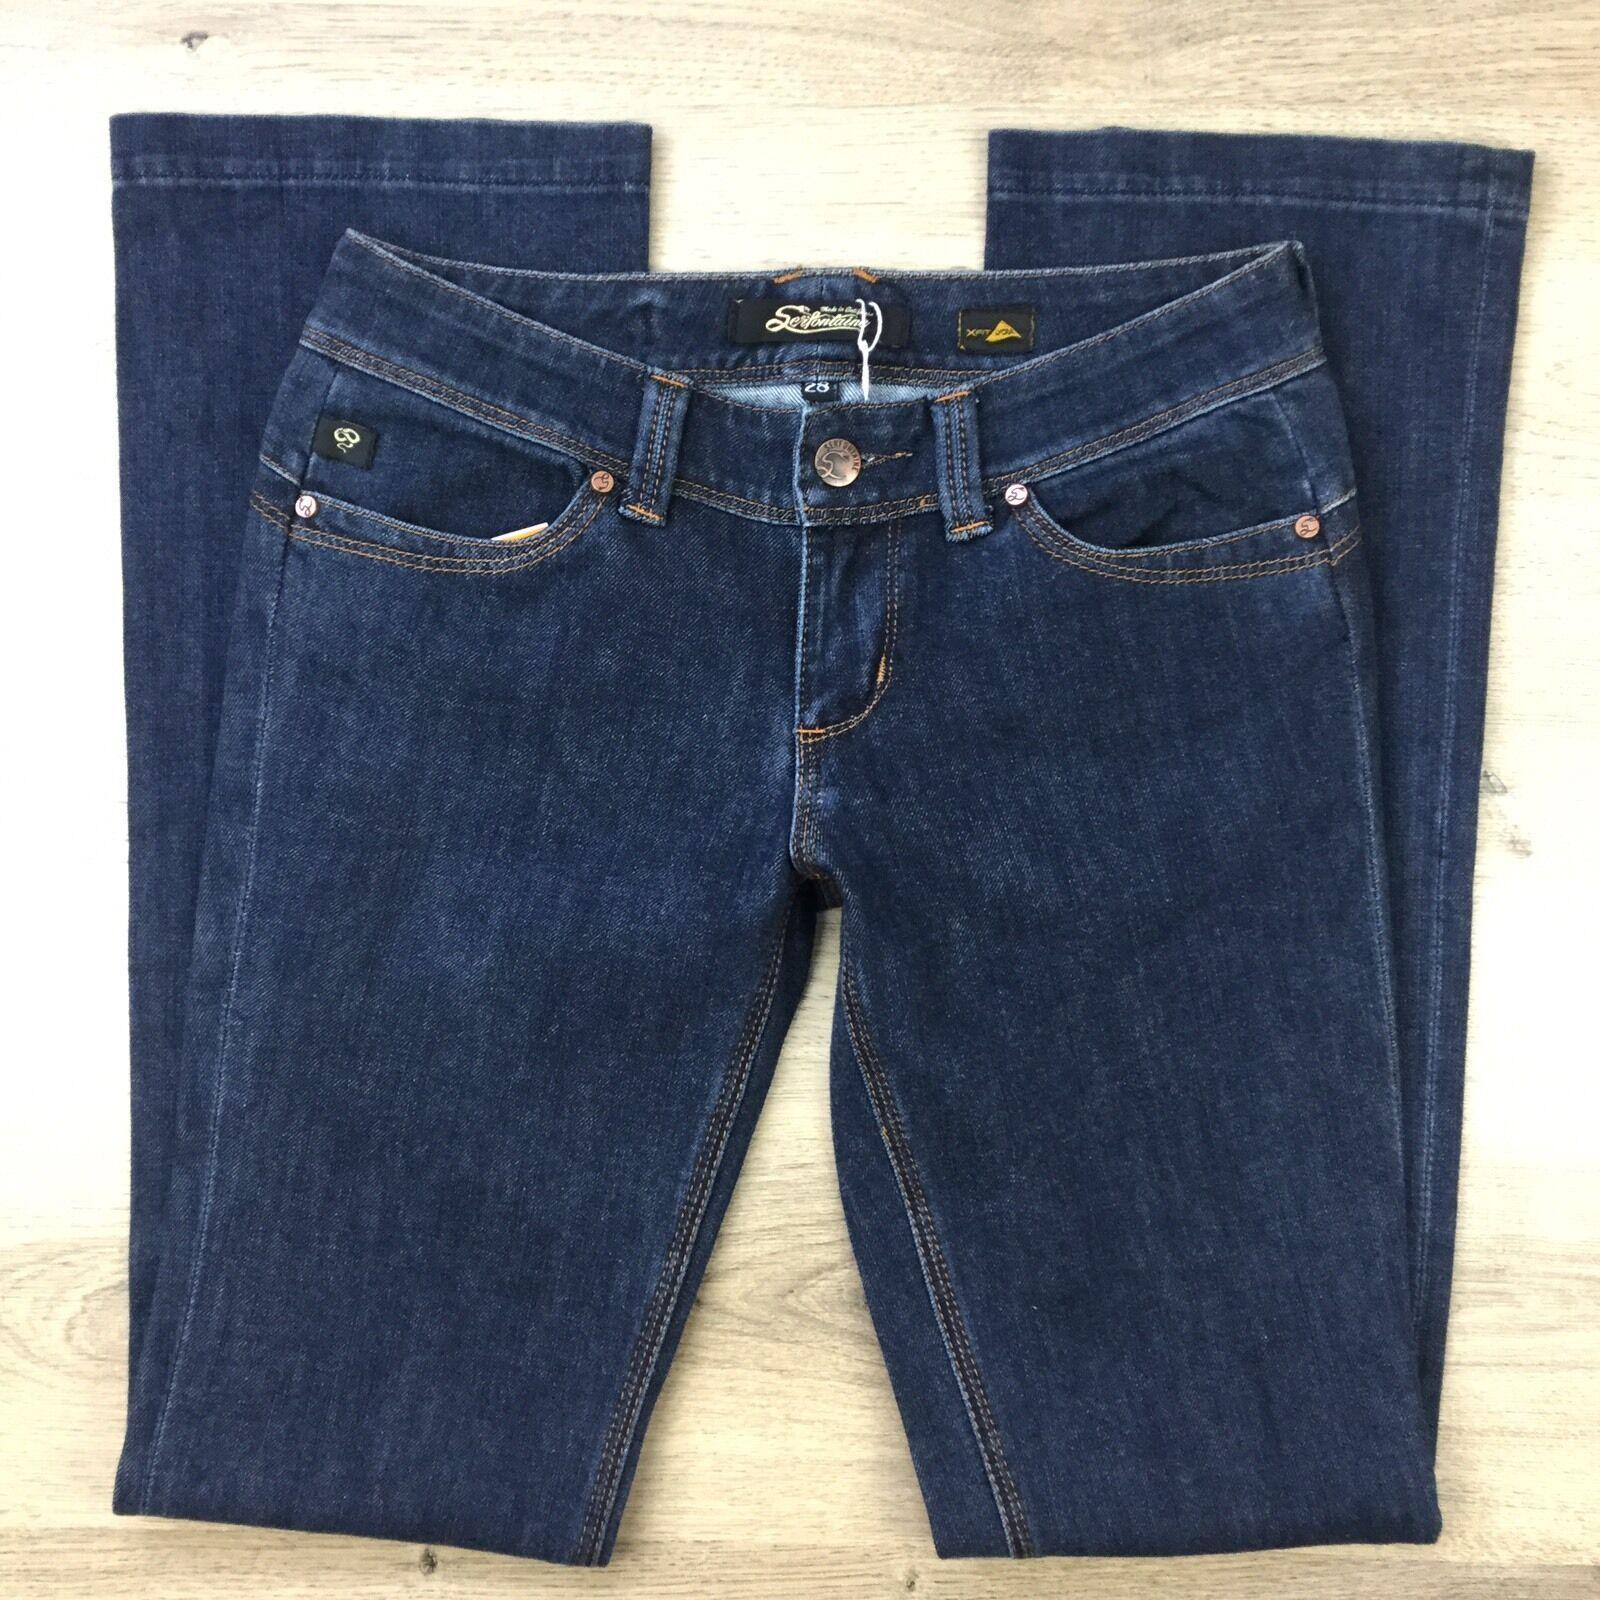 Serfontaine Feline x-fit r s Womens Bootcut Denim Jeans Size 28  (QQ4)